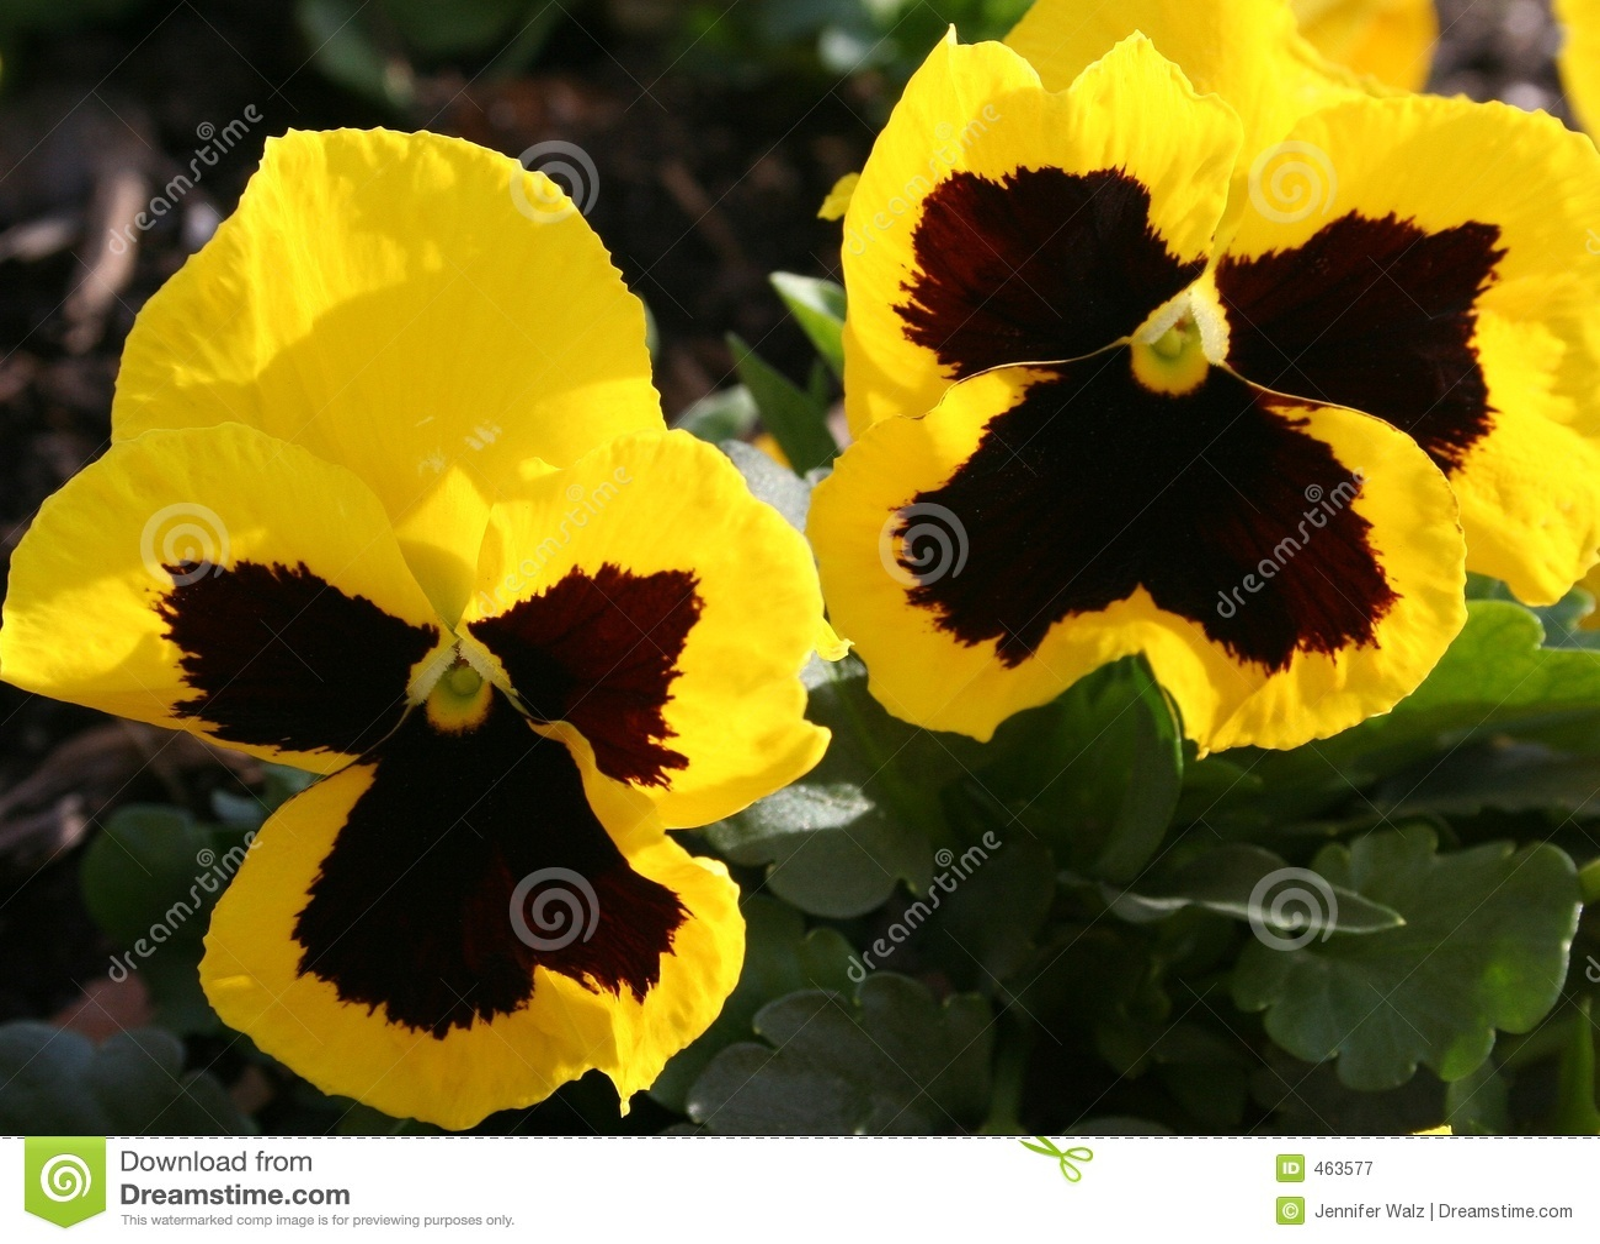 Download Winter Pansies stock image. Image of bloom, american, green - 463577